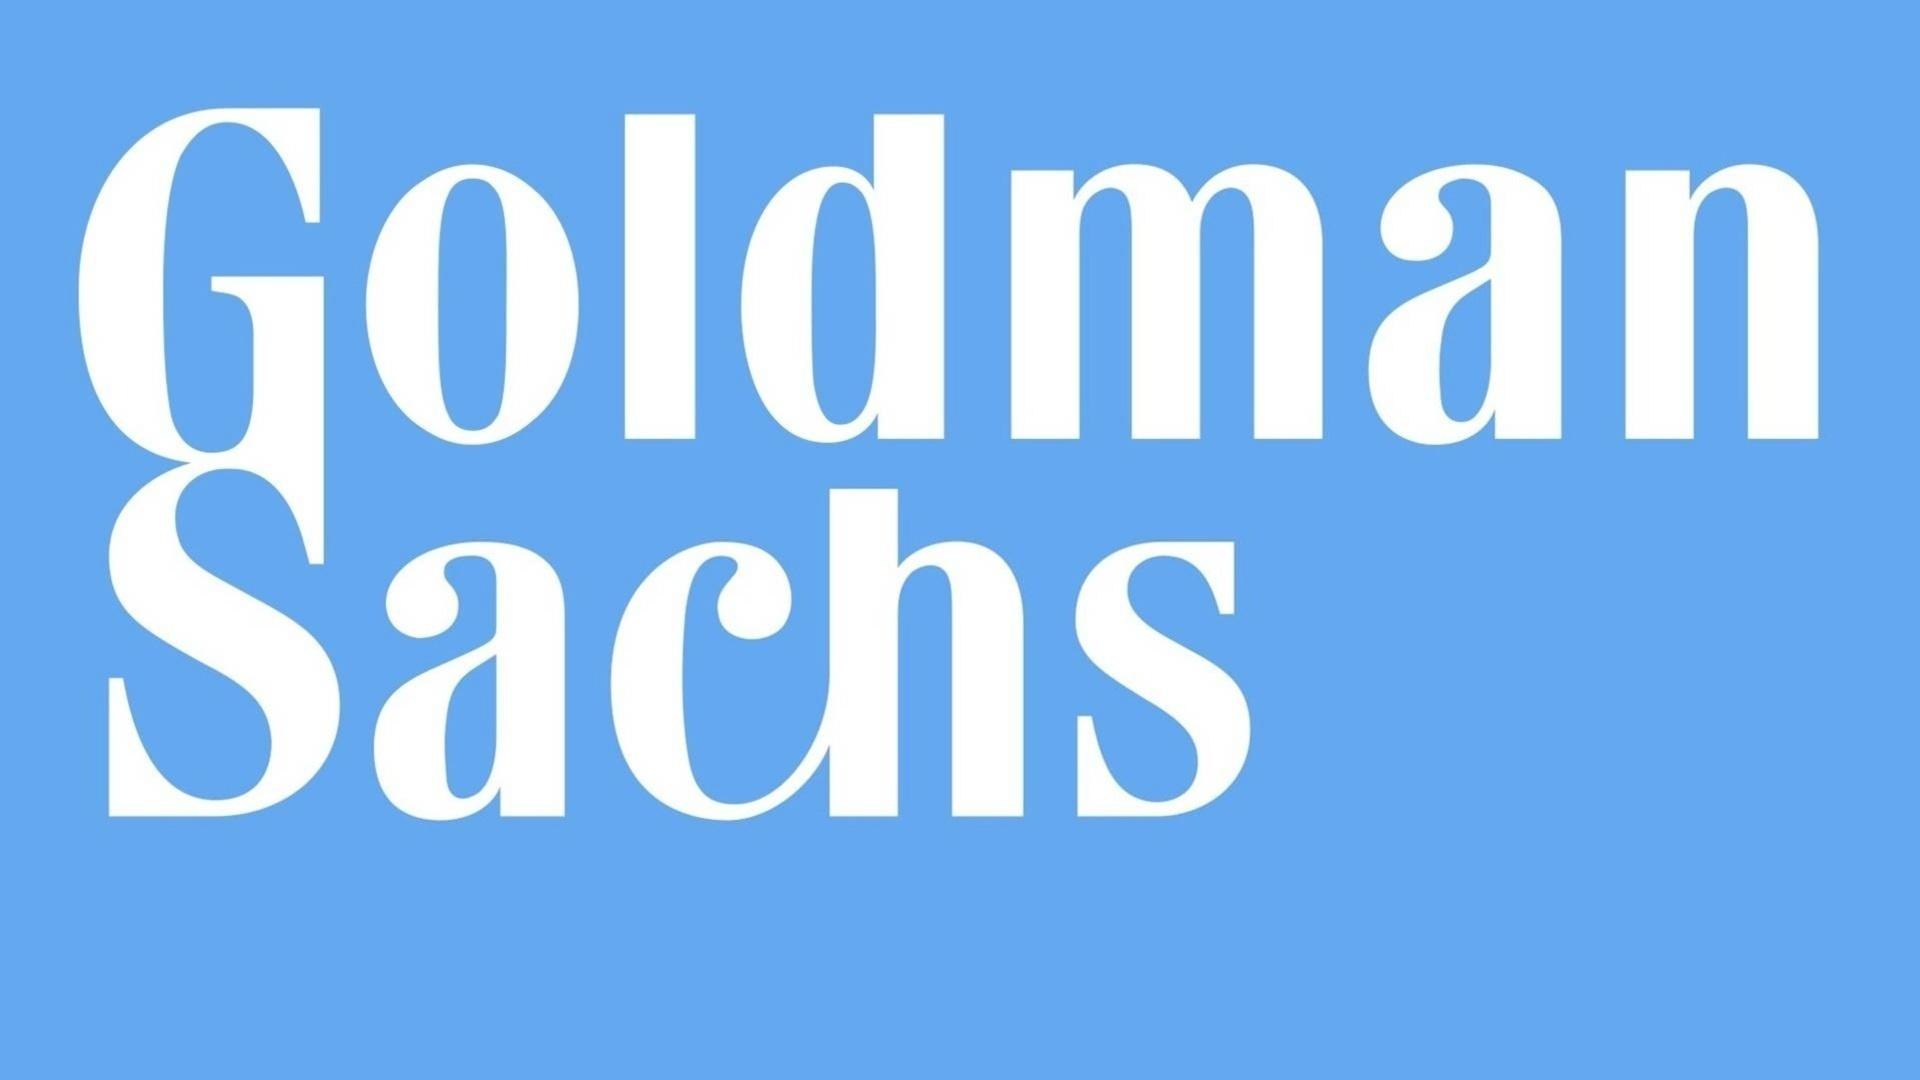 12 goldman sachs.jpg